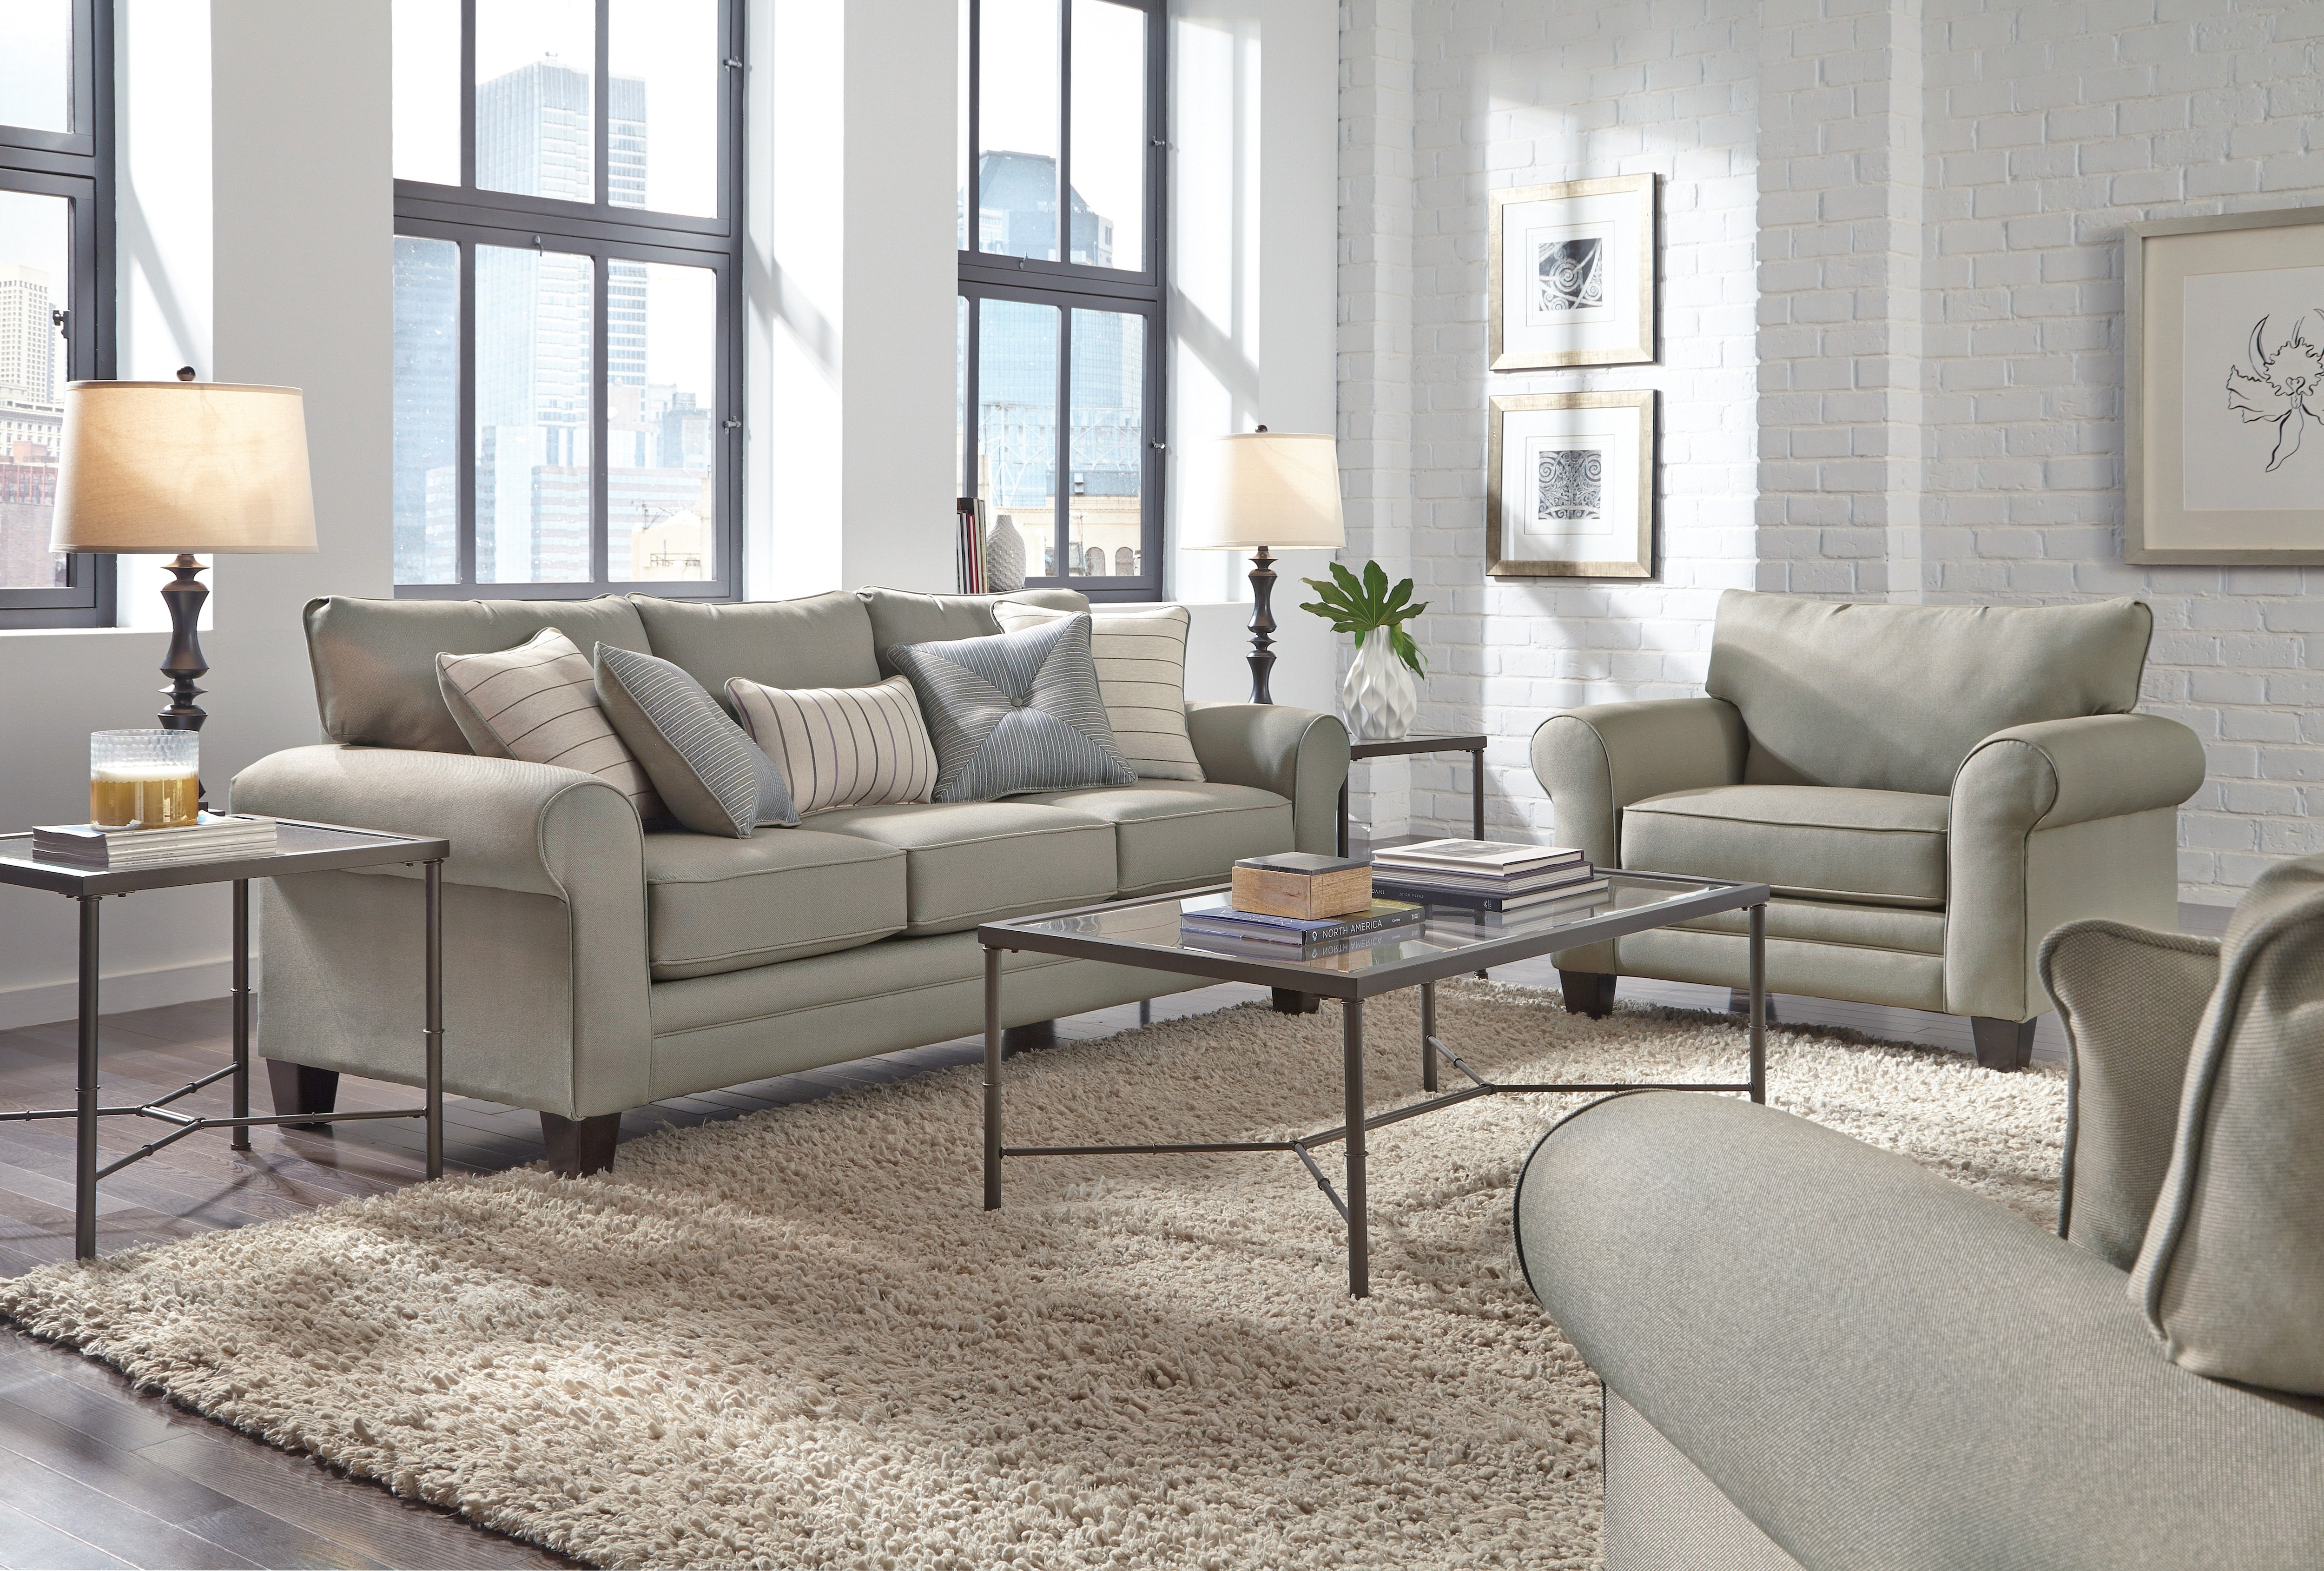 Living Room Furniture - Aspire Ottoman - Gray